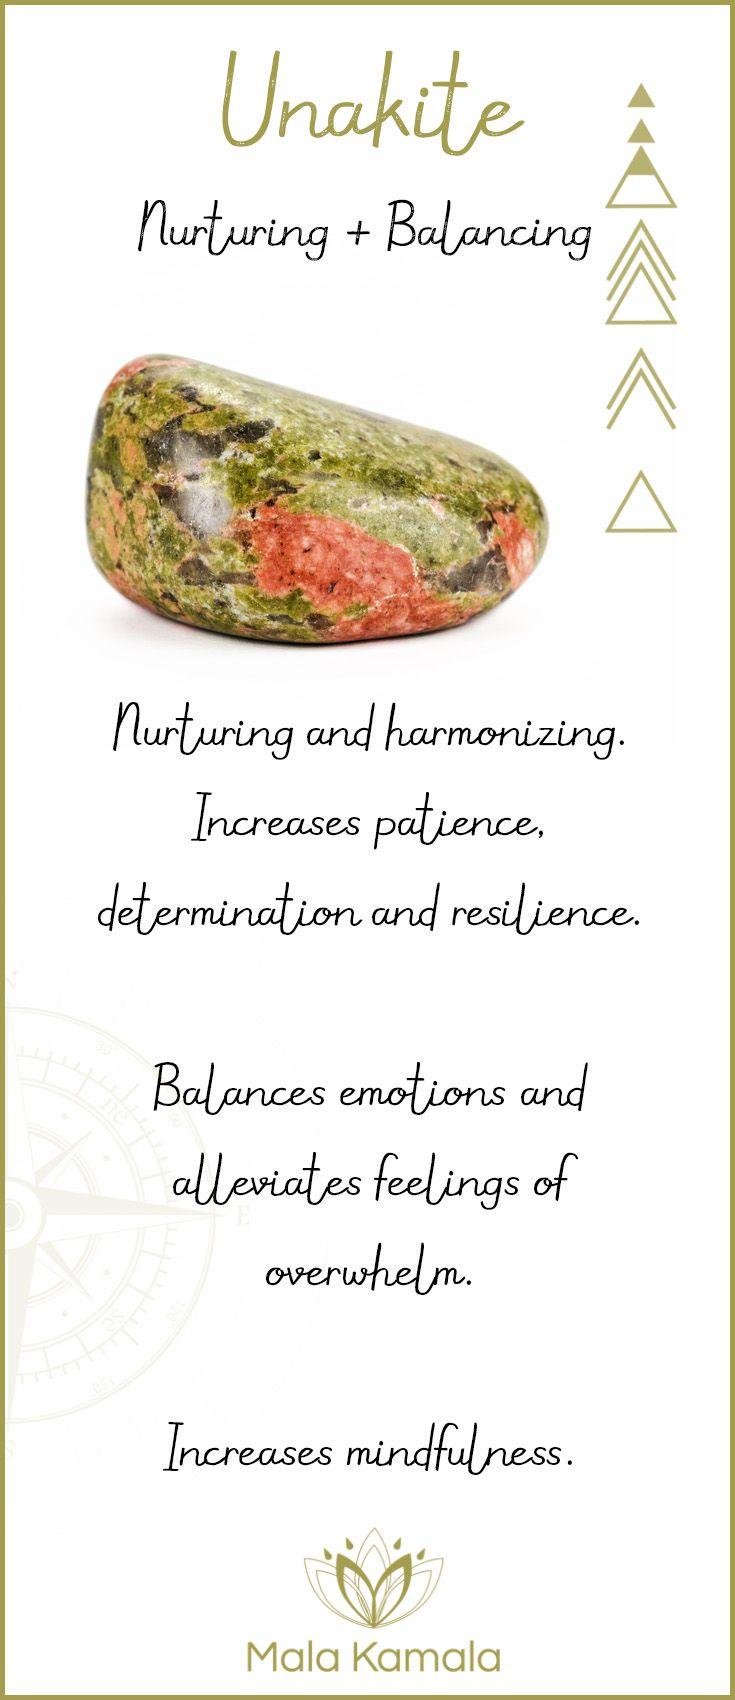 Root, Solar Plexus, Heart & Sacral Chakra Gemstones. Unakite - A stone for nurturing and balance. Nurturing and balancing.